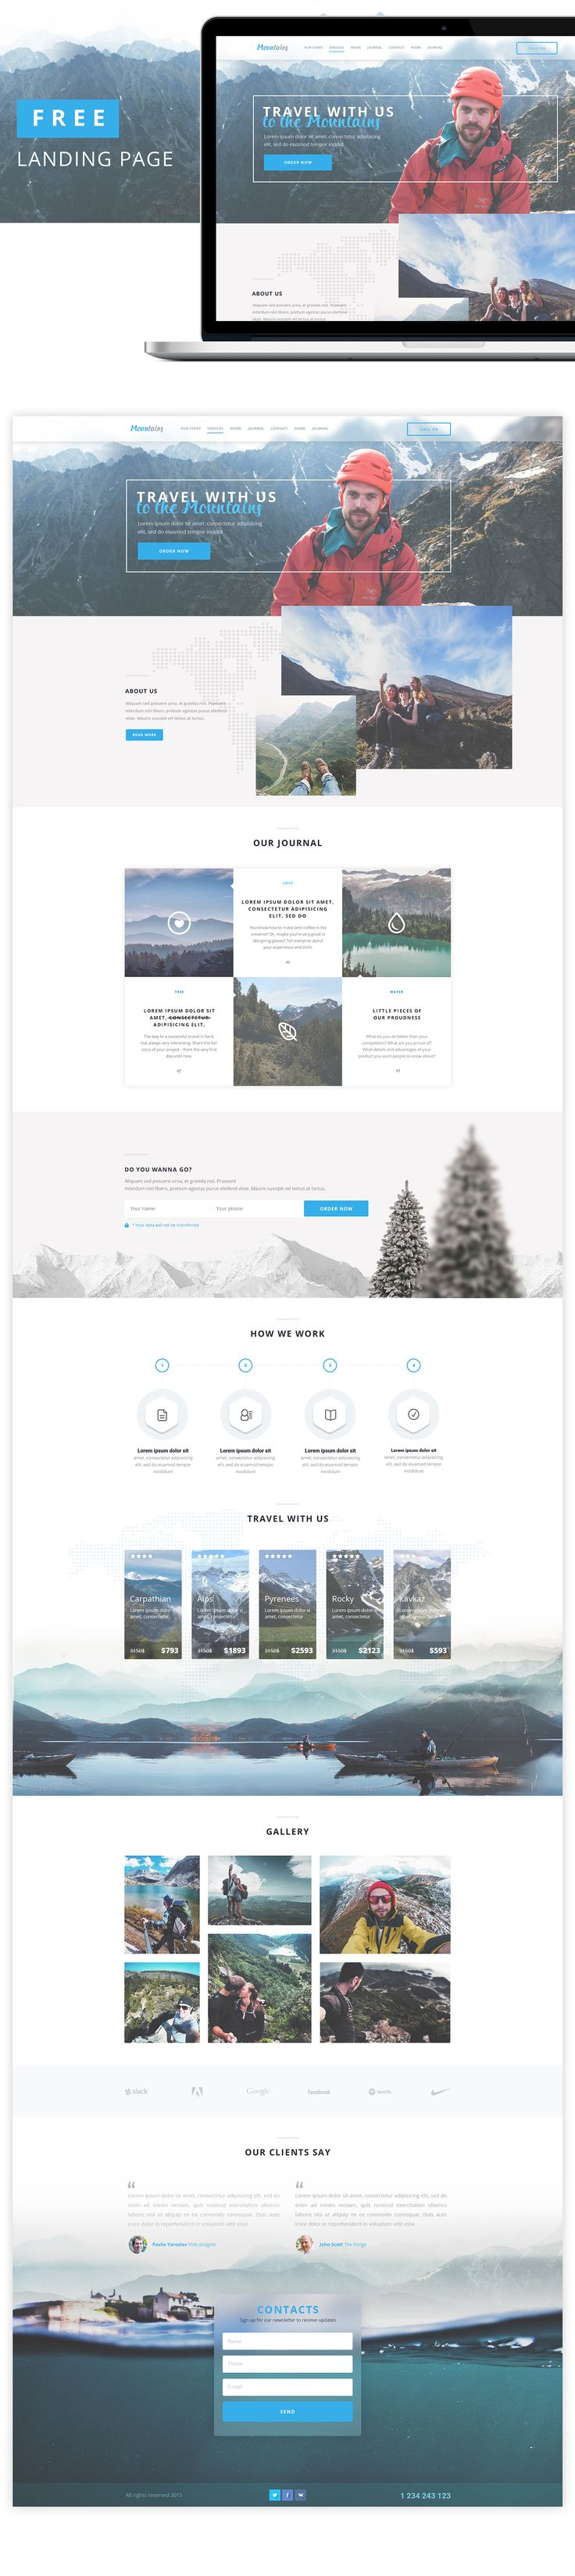 https://www.behance.net/gallery/27999261/Mountains-Landing-Page-FREE-(psd)